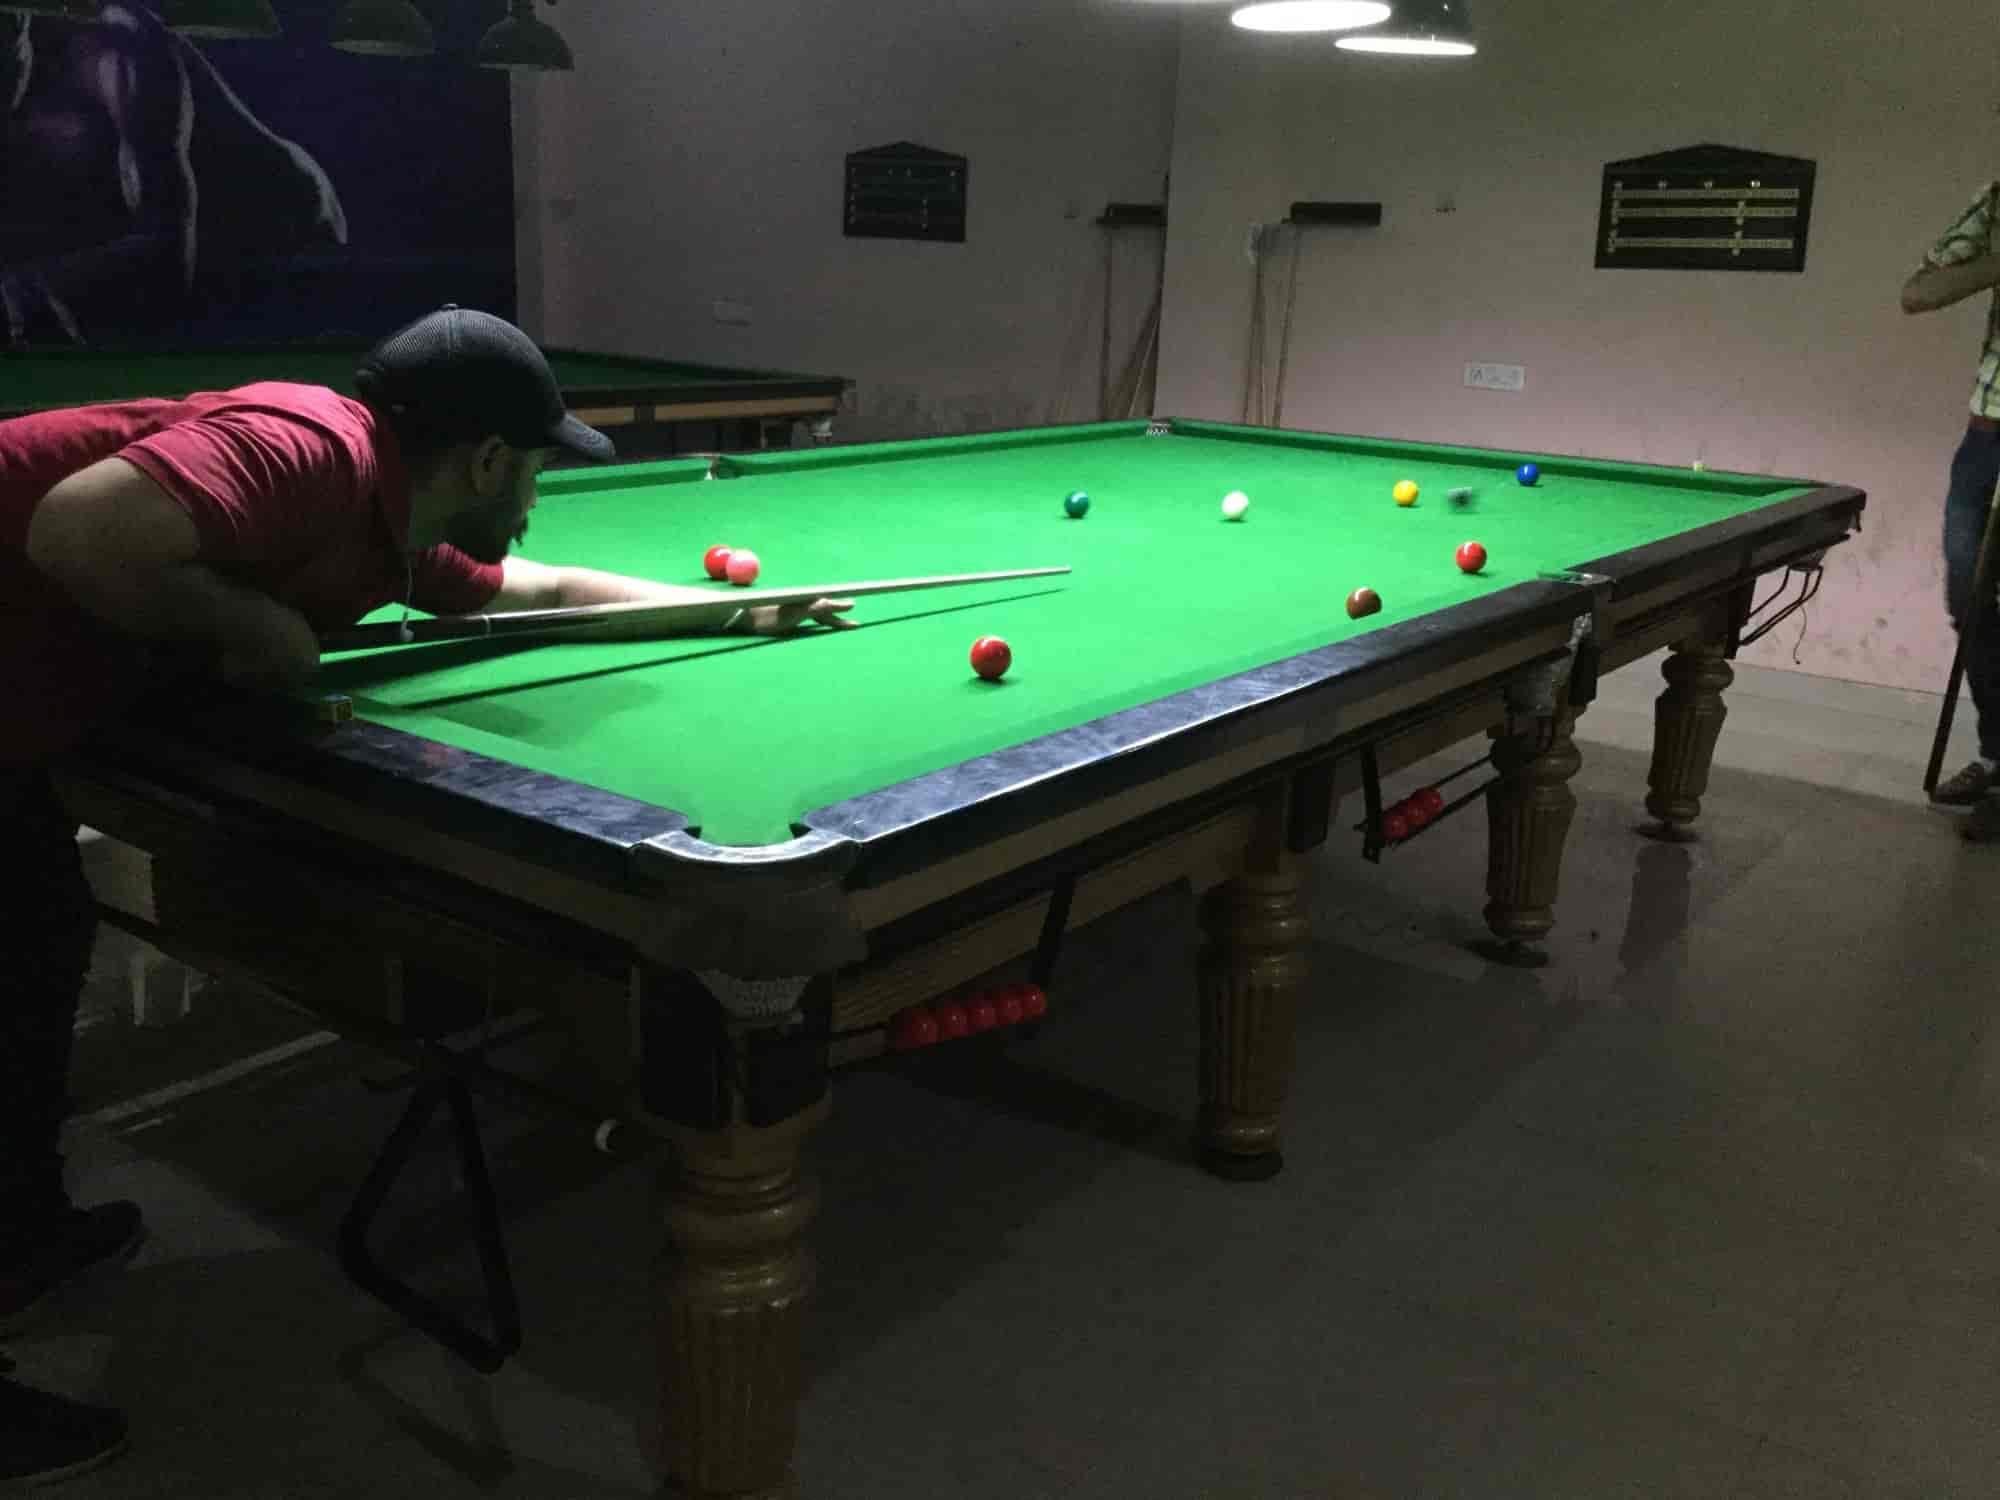 Star Snooker, Industrial Area B   Billiard Cloth Dealers In Ludhiana    Justdial